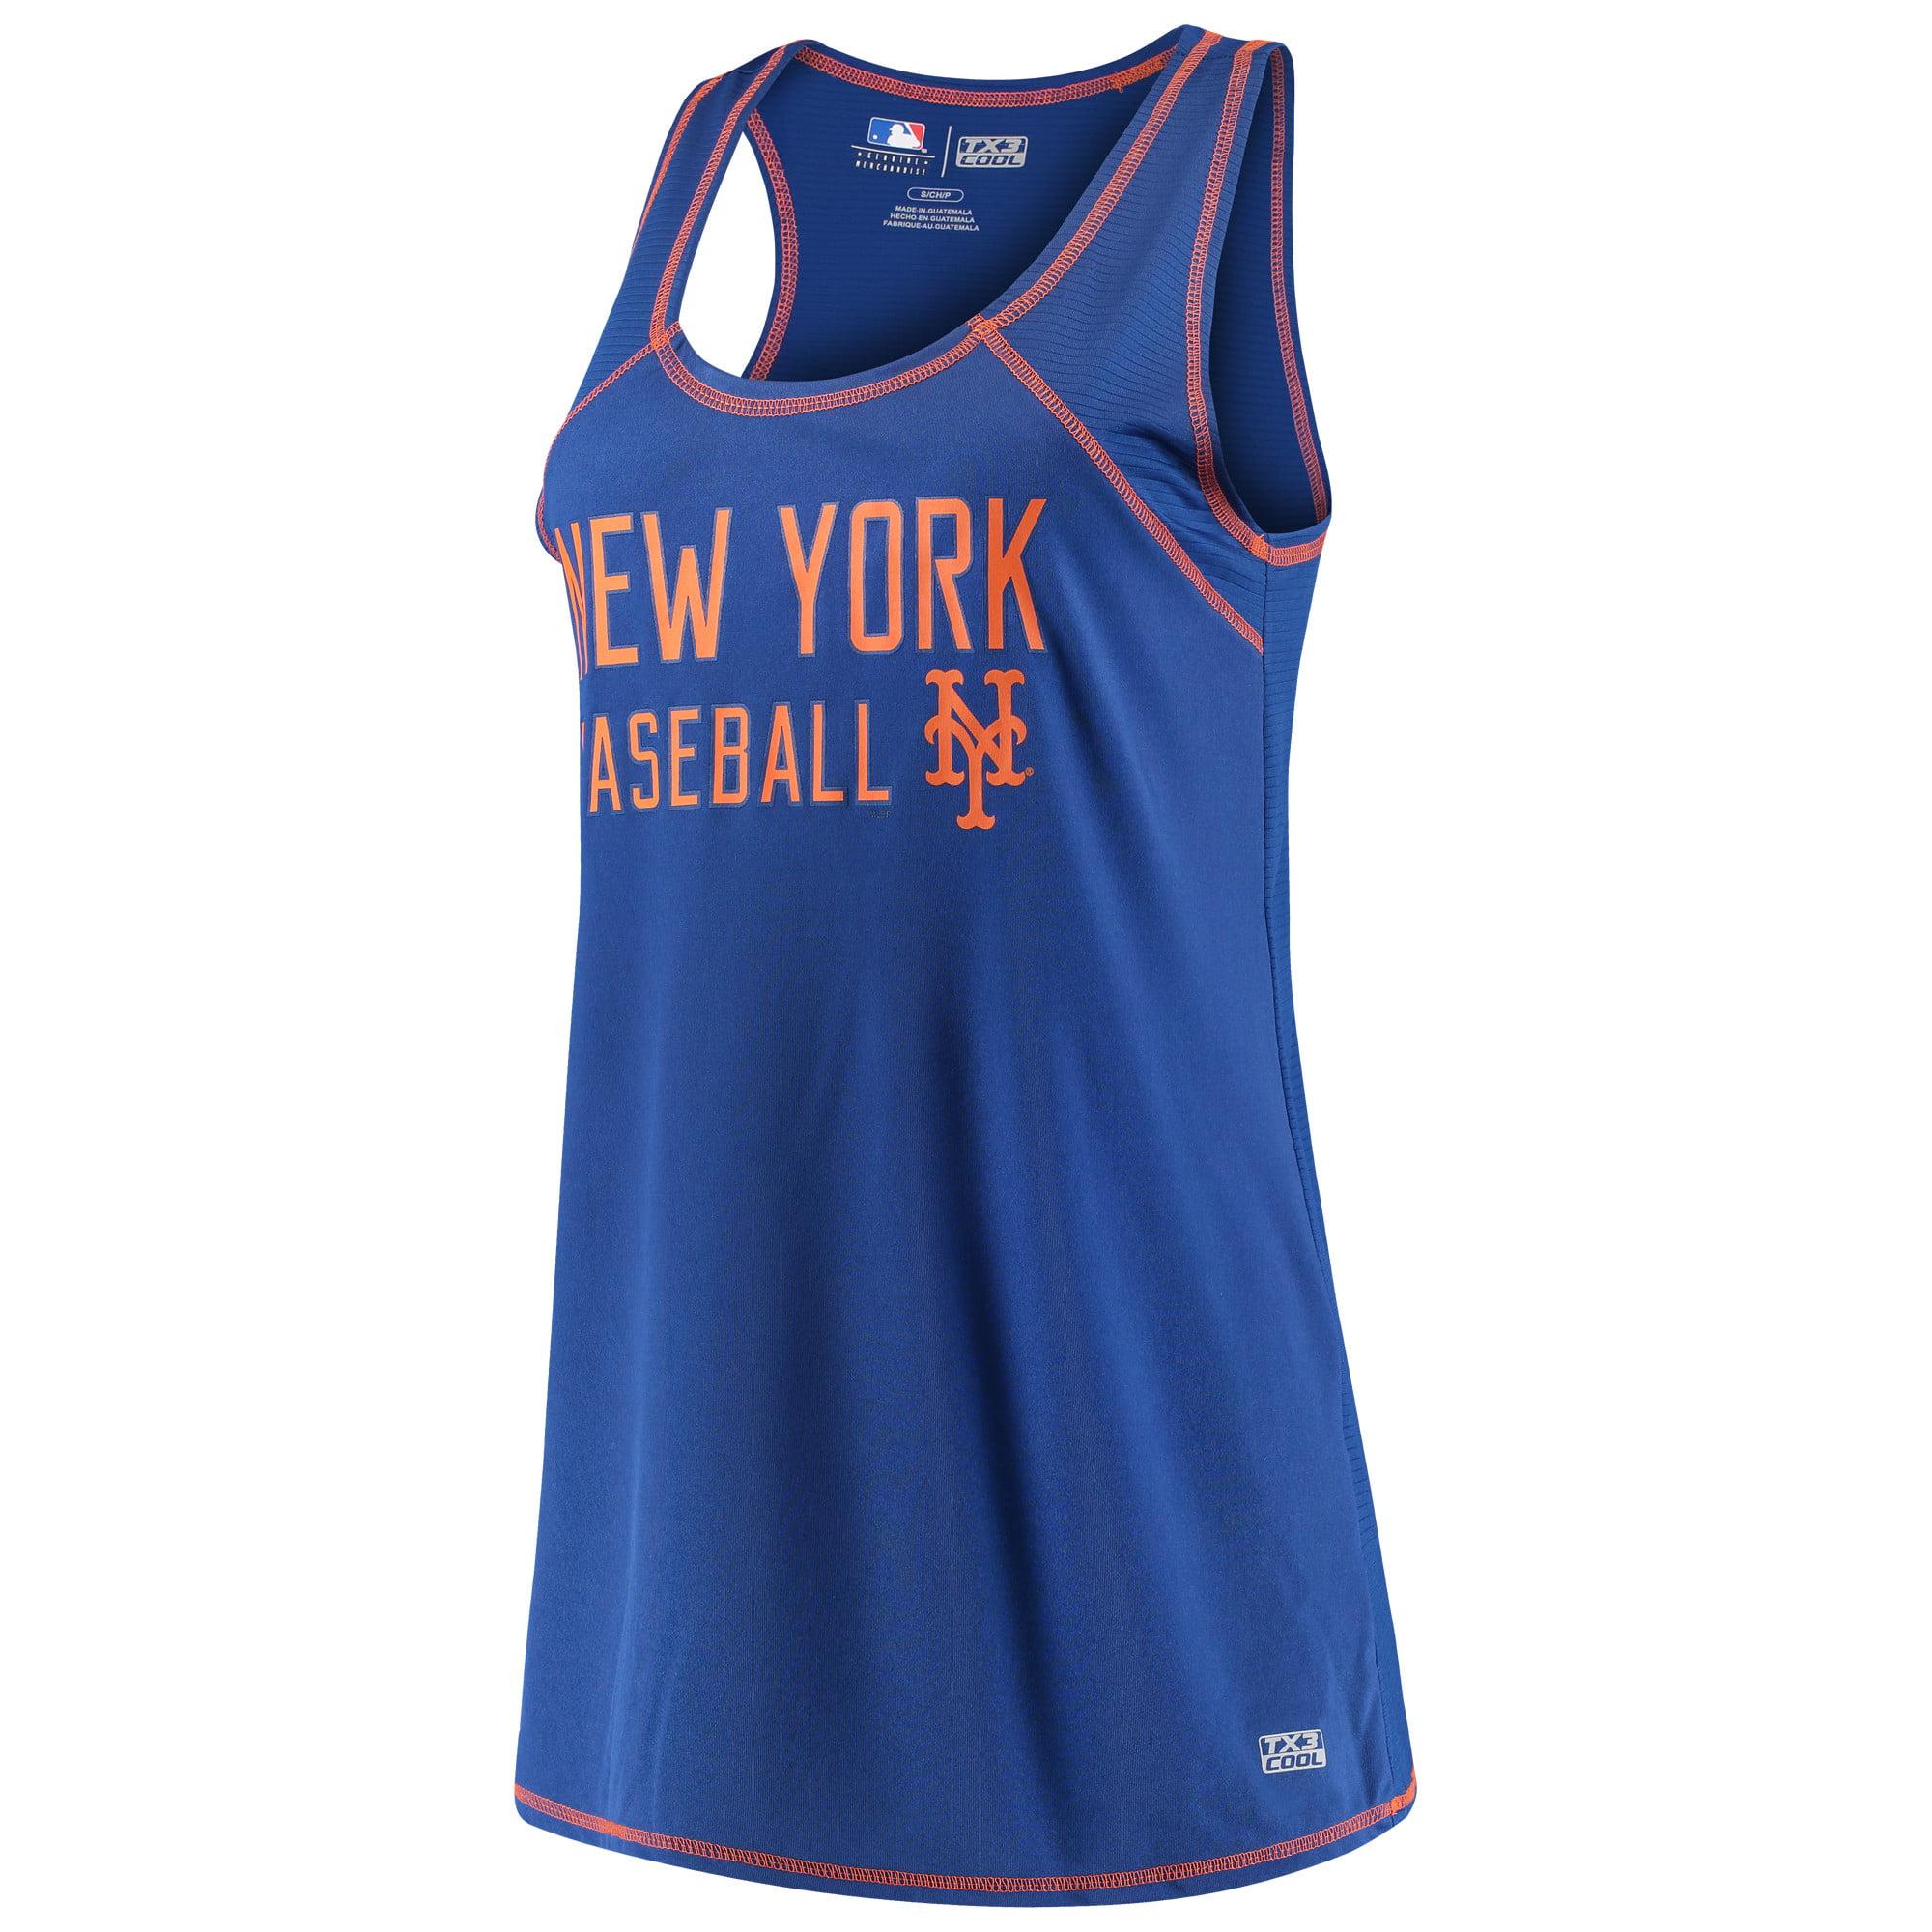 Women's Majestic Royal New York Mets TX3 Cool Fabric Scoop Neck Tank Top